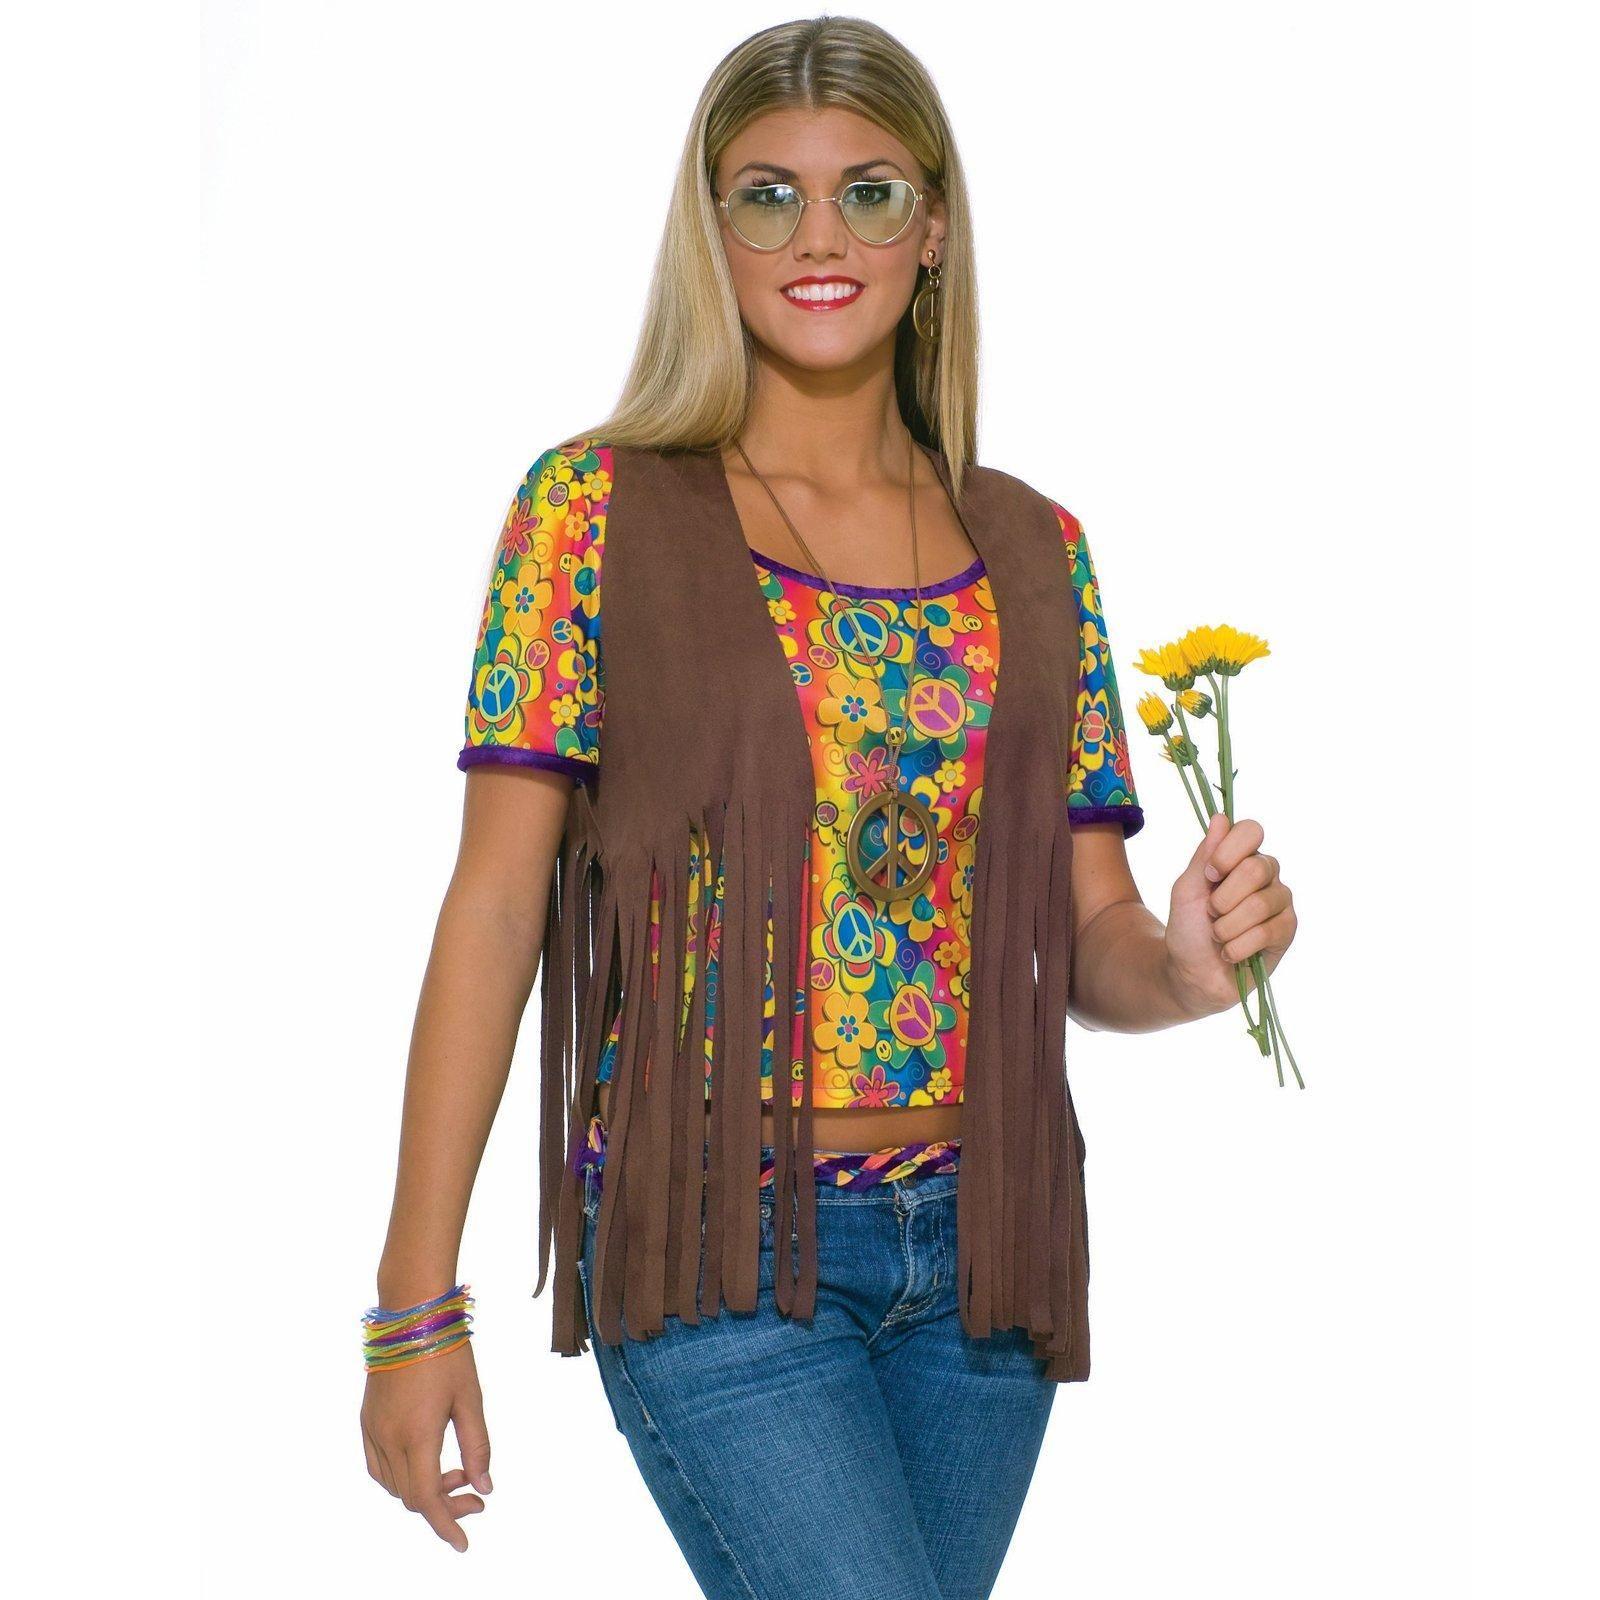 Be A Hippie For Halloween | Homemade Hippie Costume Ideas | Halloween | Pinterest | Hippie ...